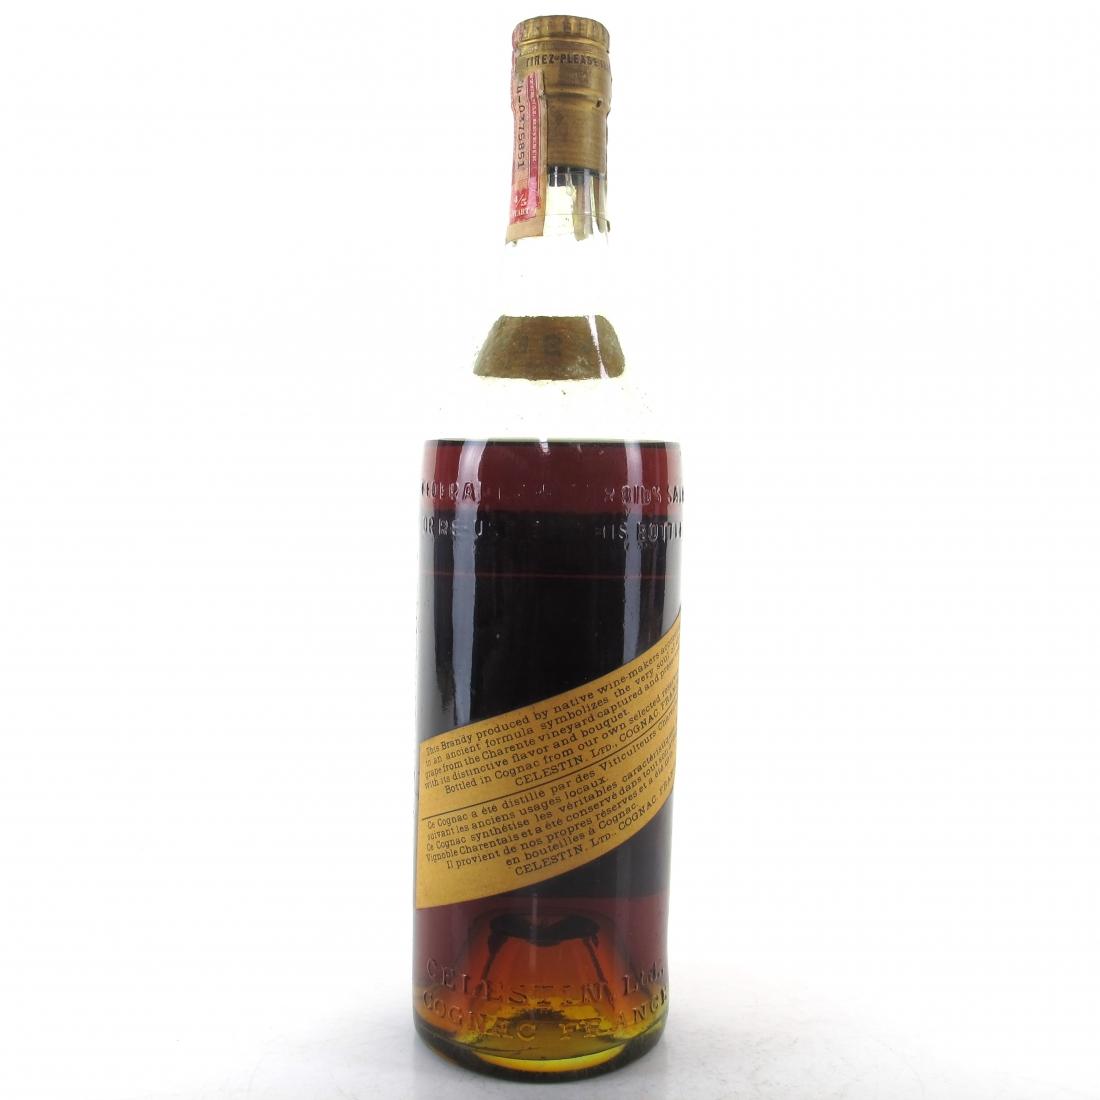 Celestin's VSEP 20 Year Old Cognac 1940s / US Import